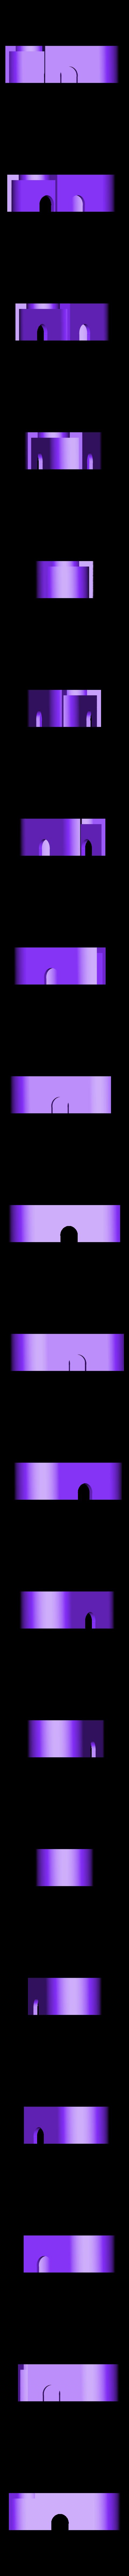 Blender_Gear_Housing.STL Download free STL file Hand Mixer • 3D printable design, alterboy987